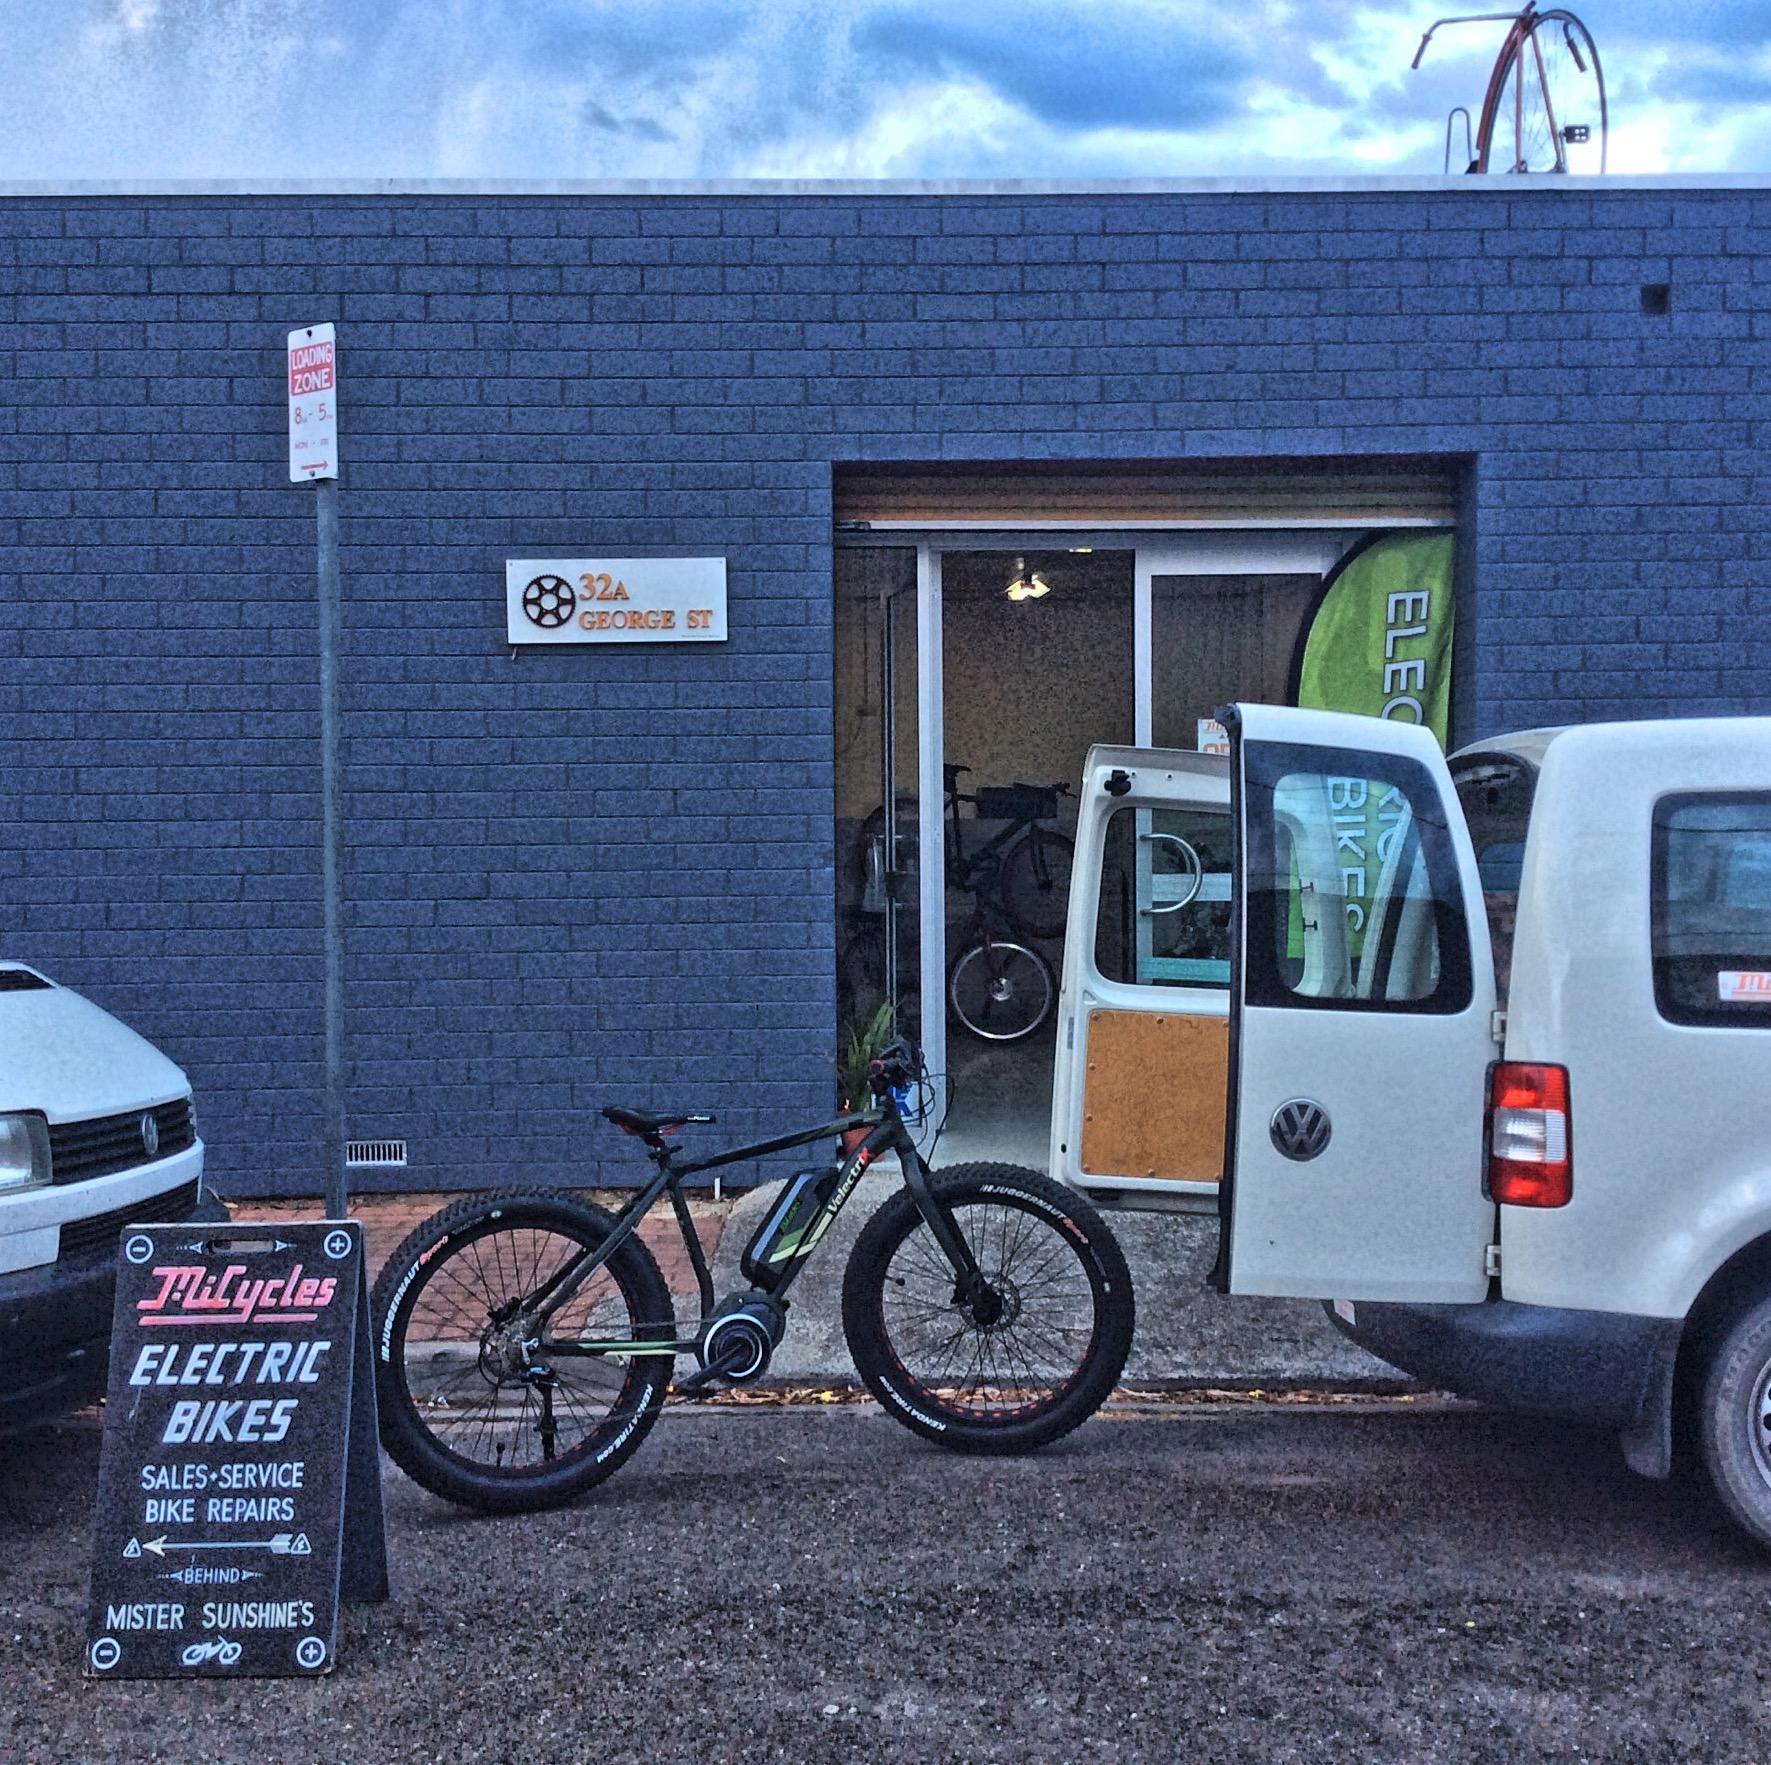 MiCycles Electric Bike Shop.JPG